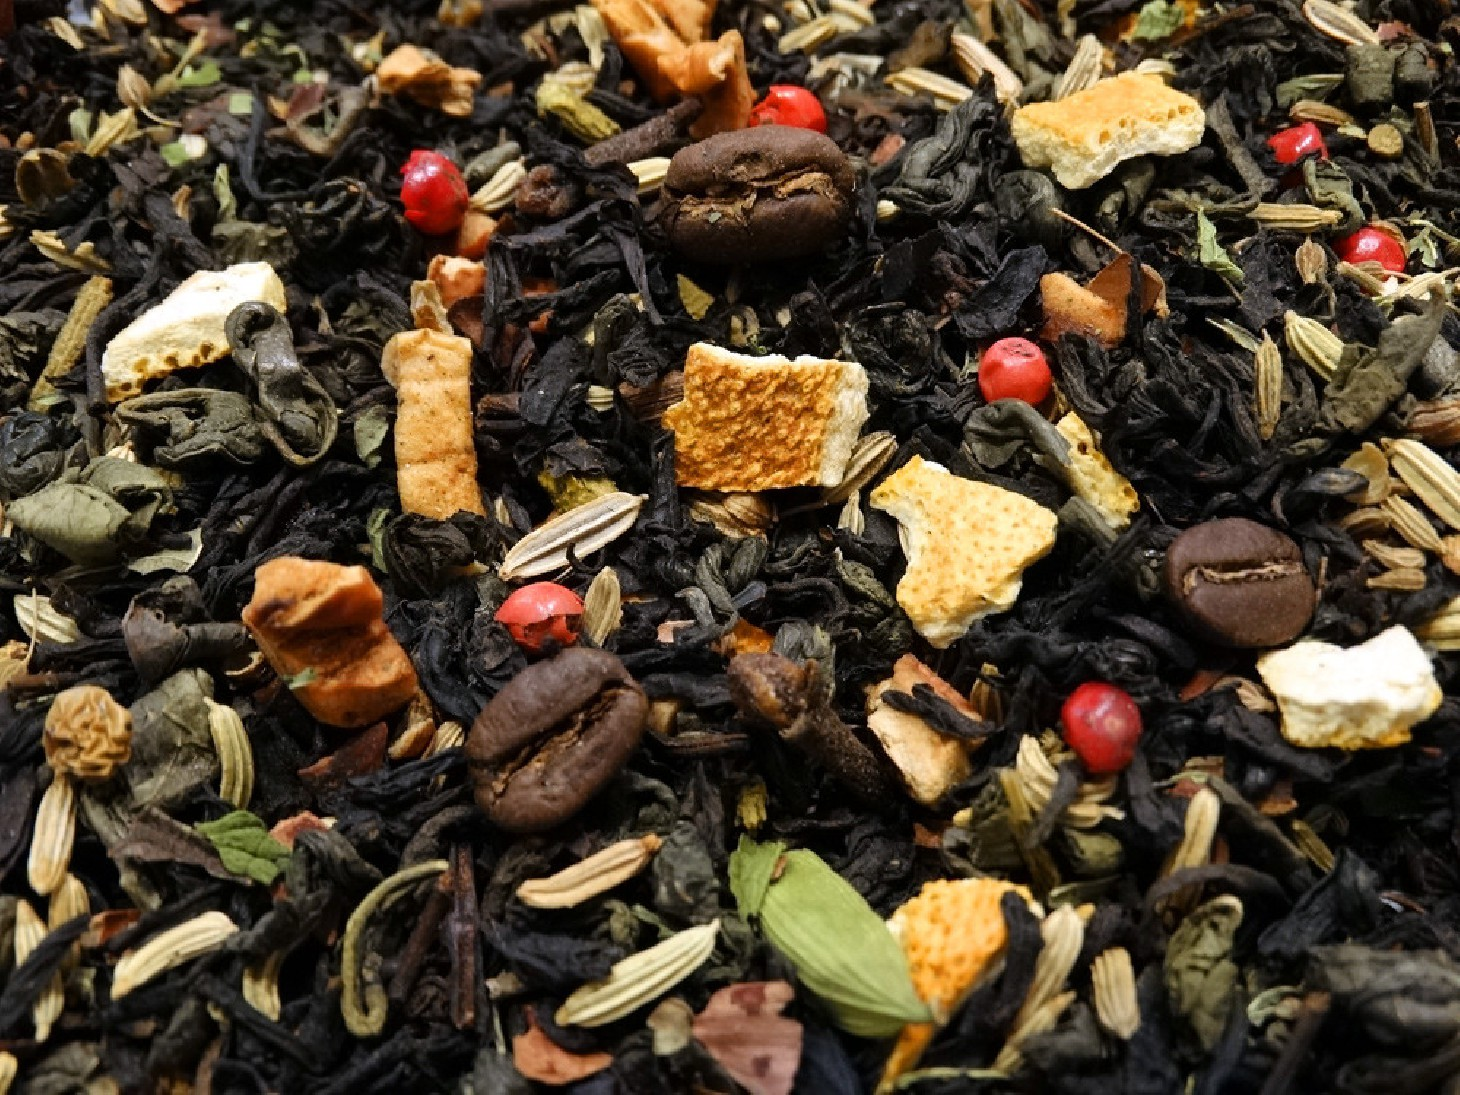 Green & black tea, Mocha beans, Mint, Citrus fruits, Spices